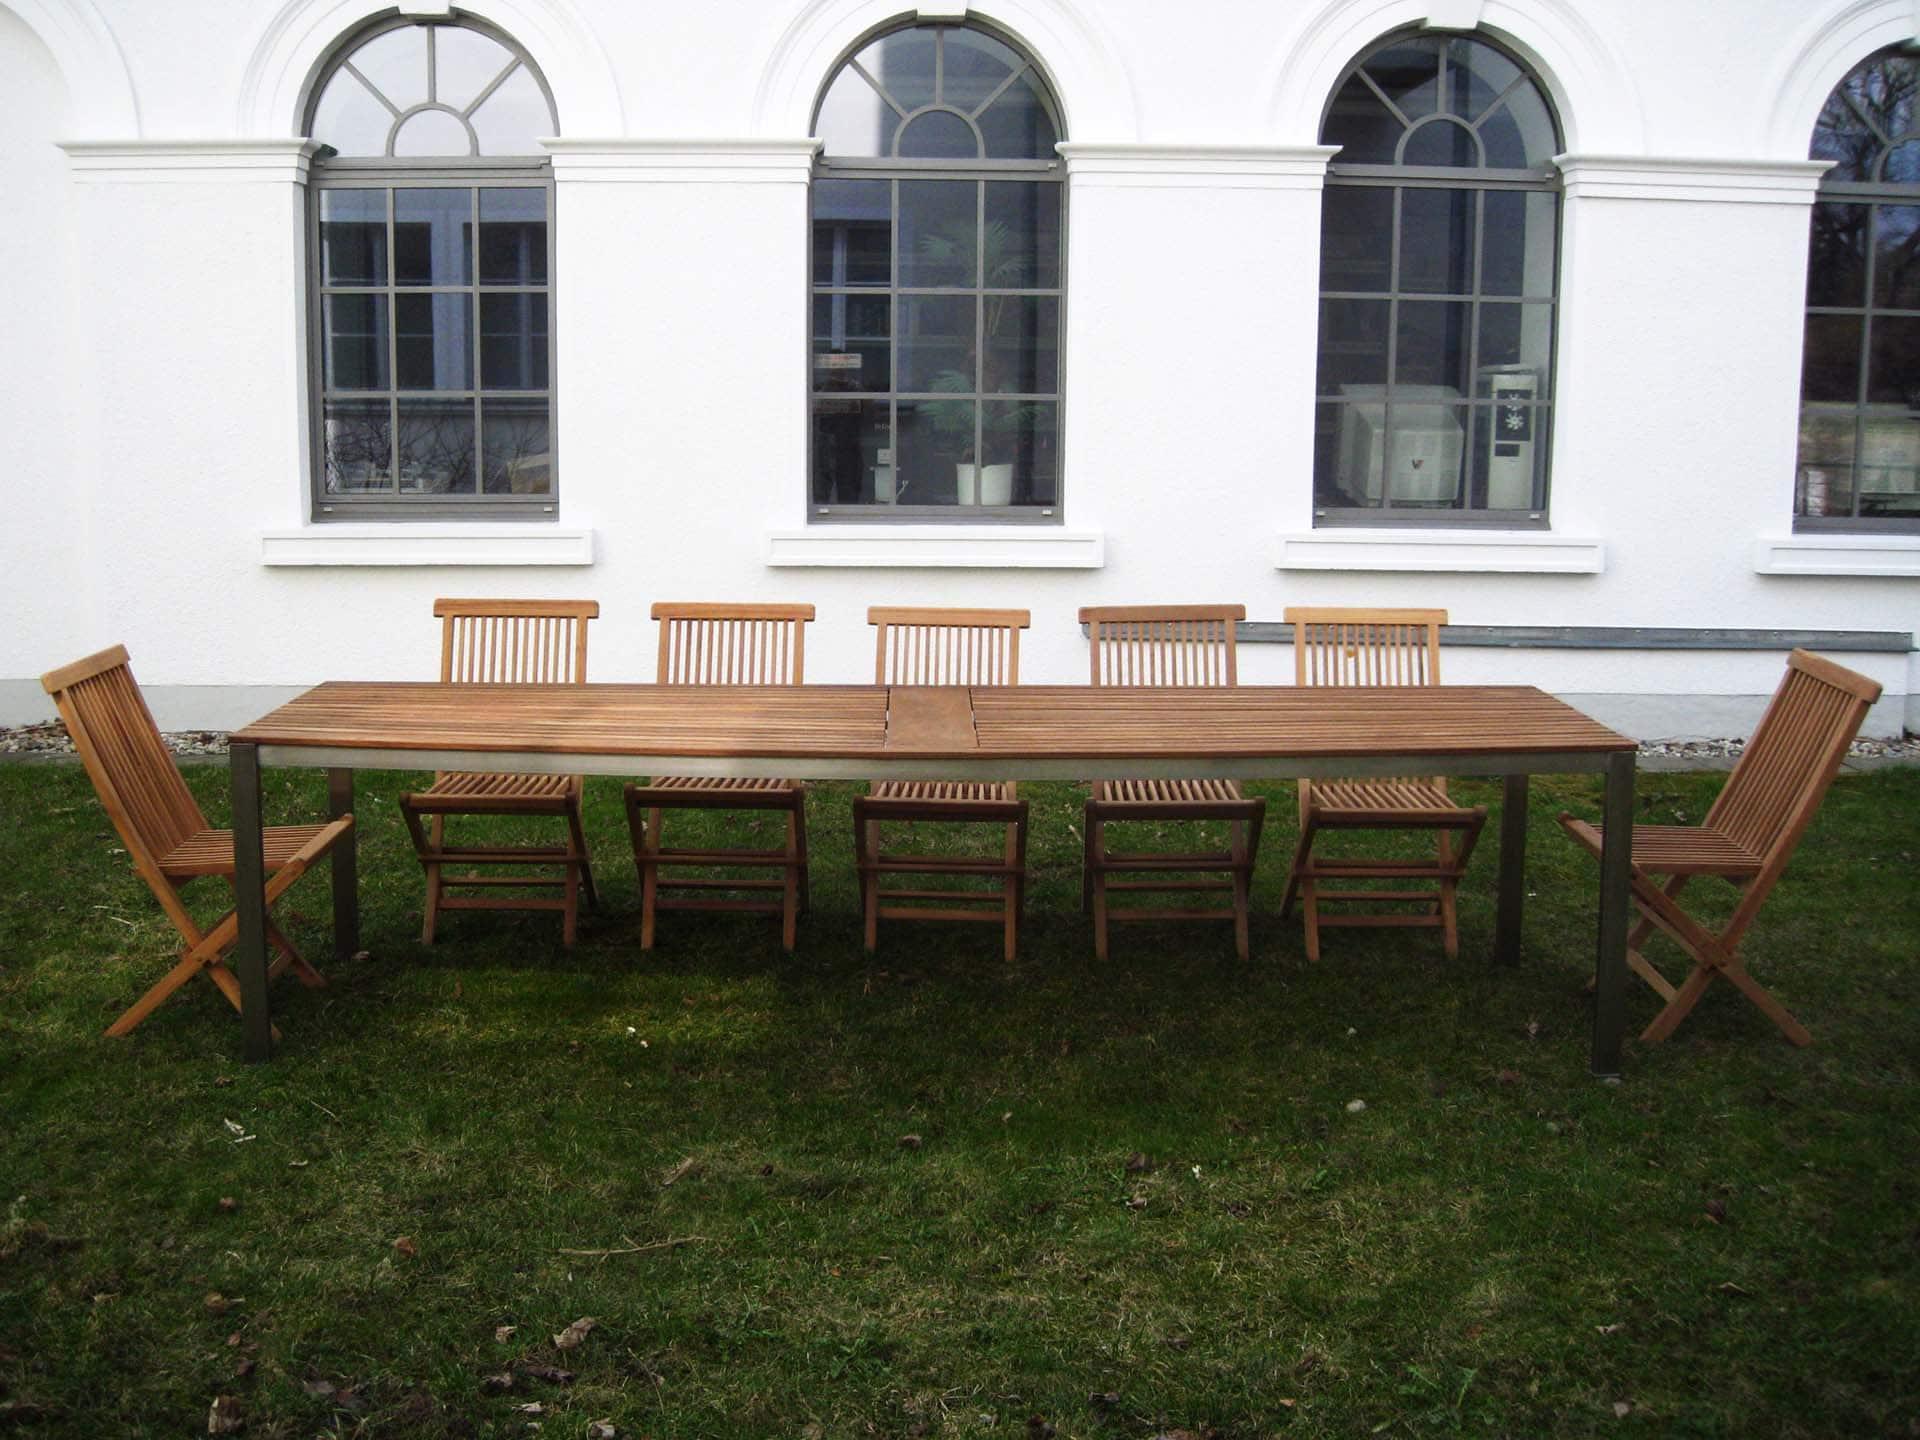 Design Tisch Sealine Nummer 4 aus Holz Metall by Sebastian Bohry